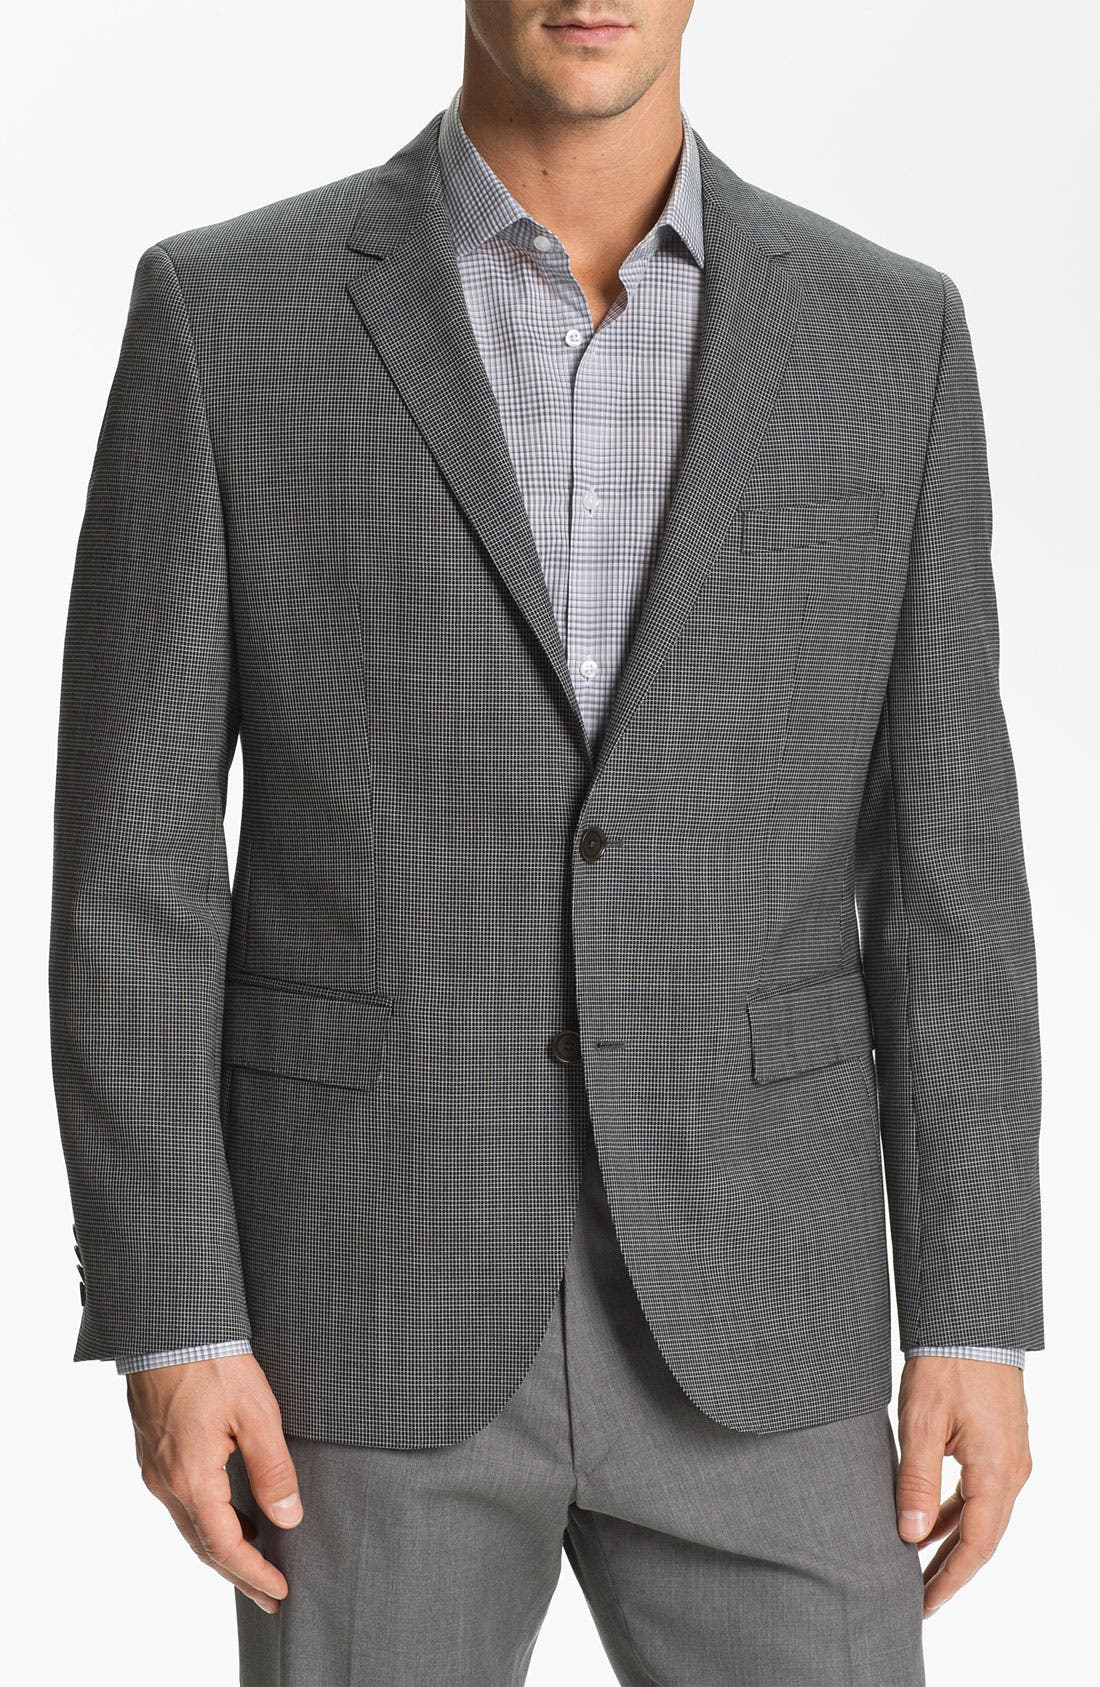 Main Image - BOSS Black 'Keys' Trim Fit Check Sportcoat